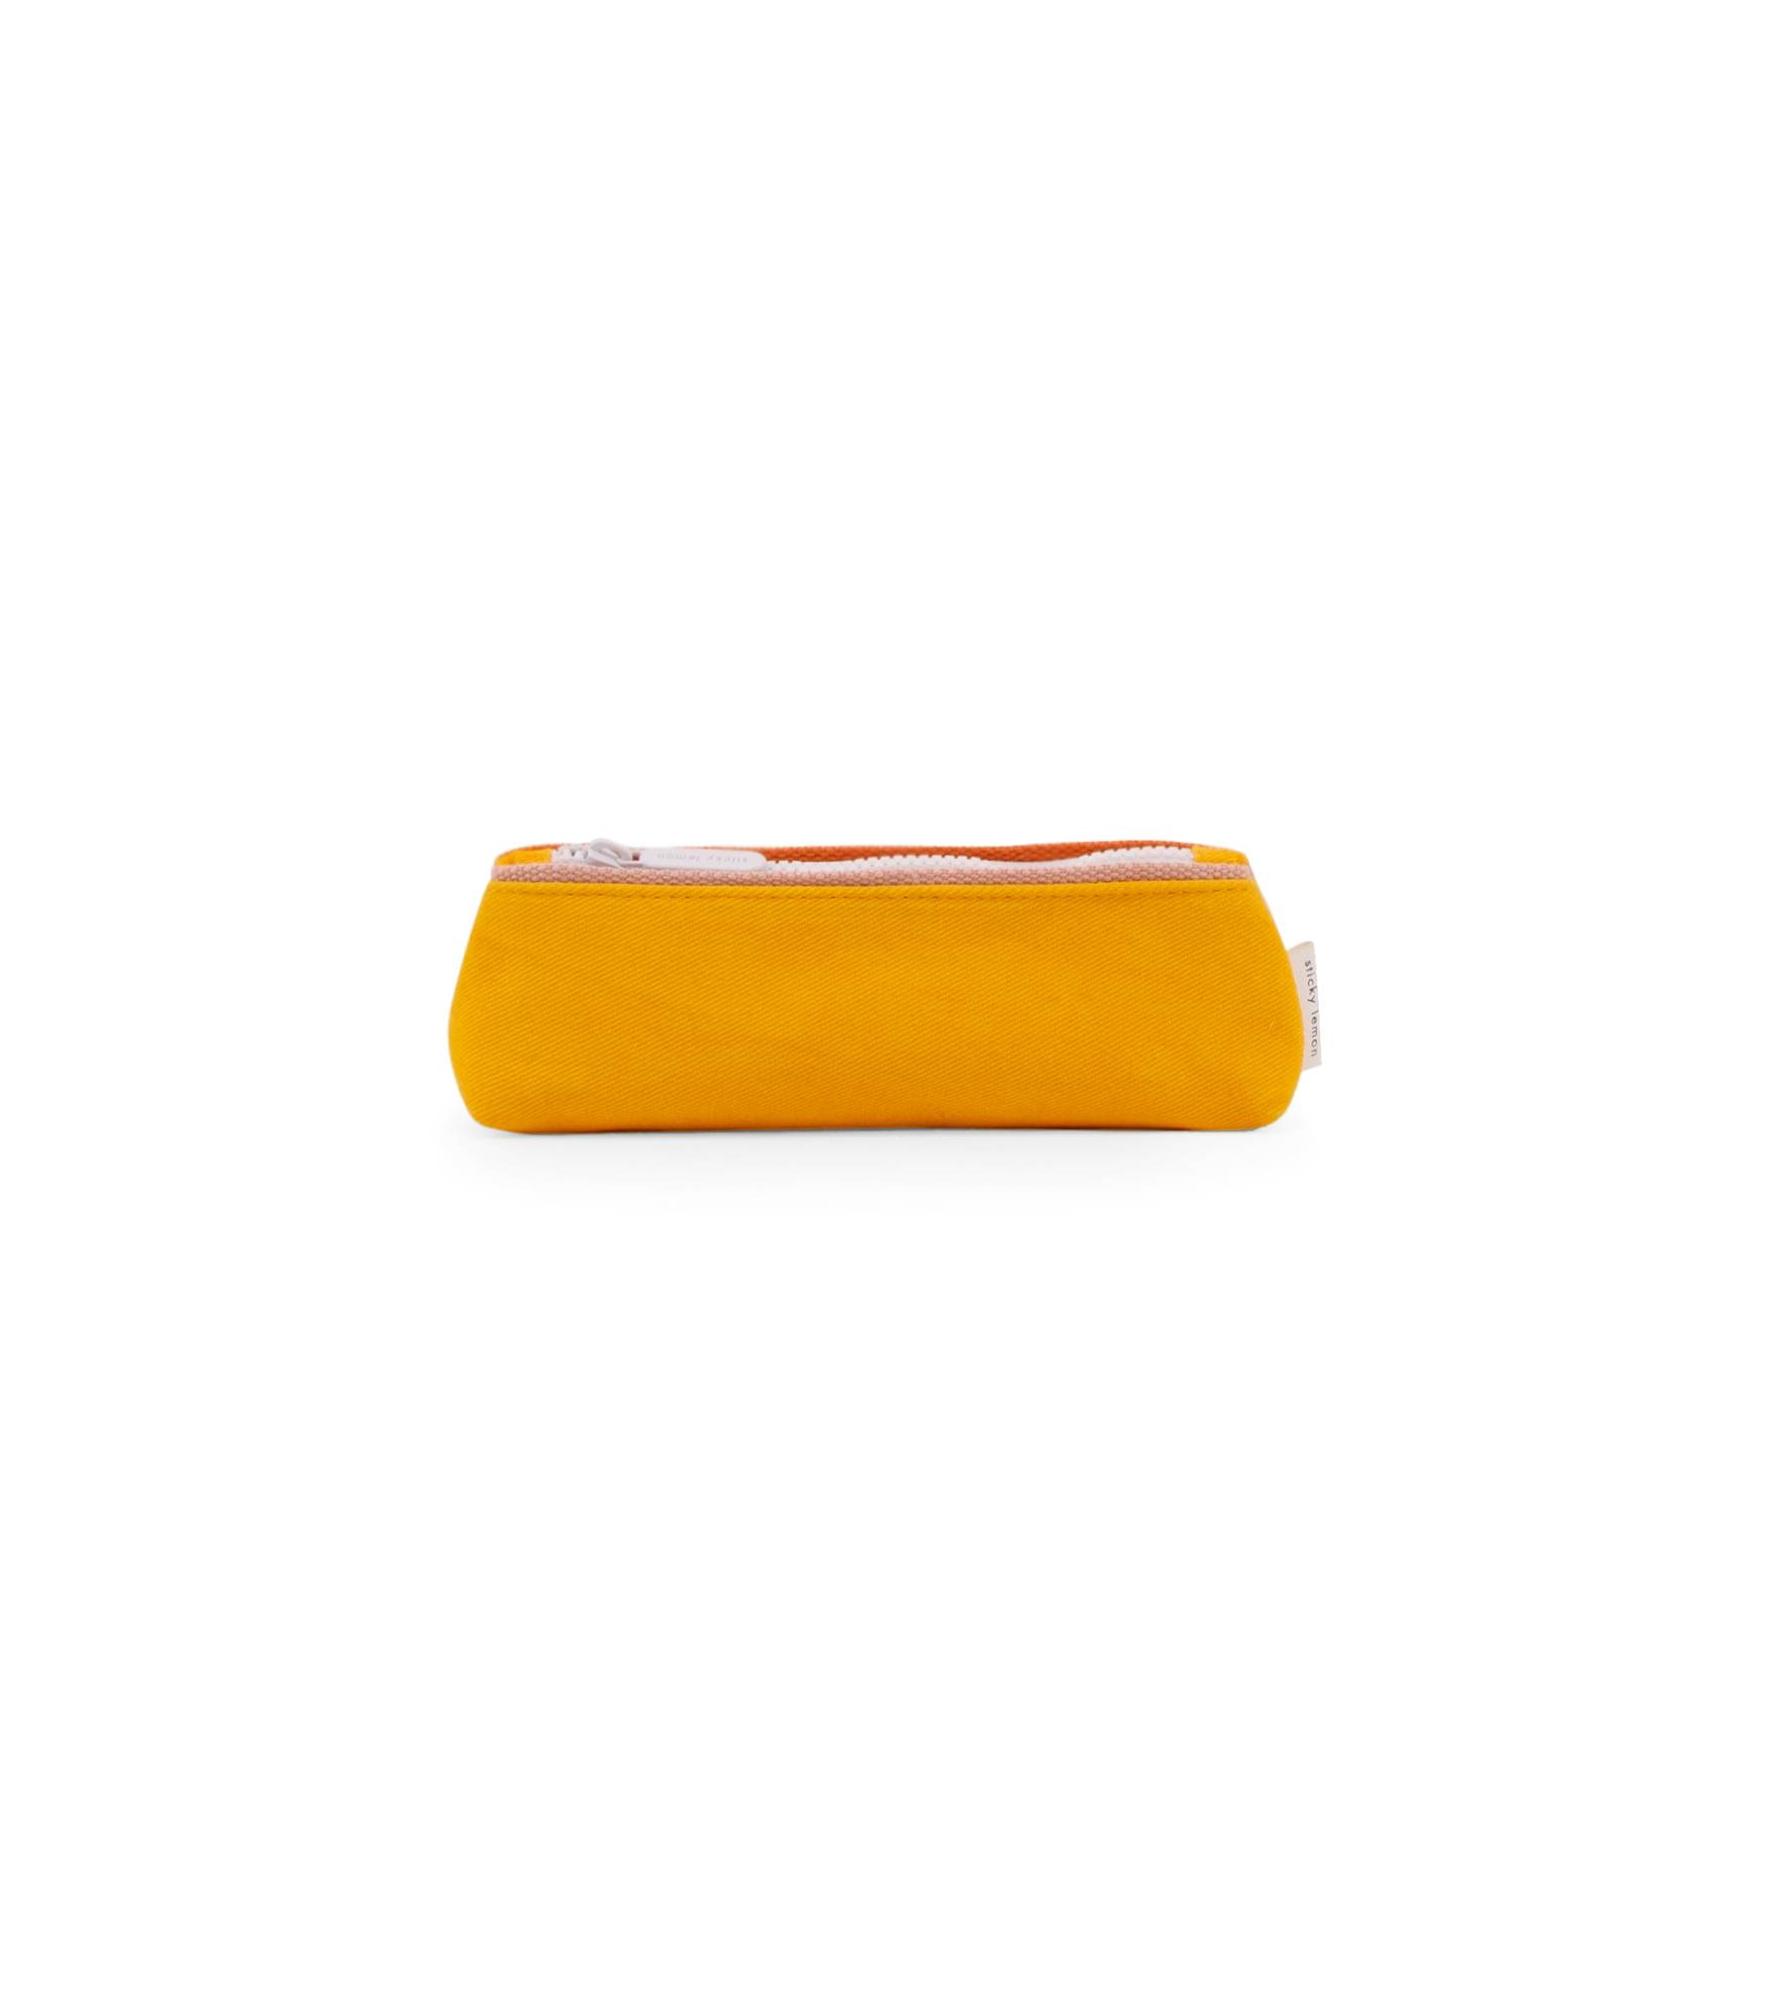 1801654_â___Sticky_Lemon_-_freckles_-_pencil_case_-_sunny_yellow_+_carrot_orange_+_candy_pink__ (2)_edit.jpg